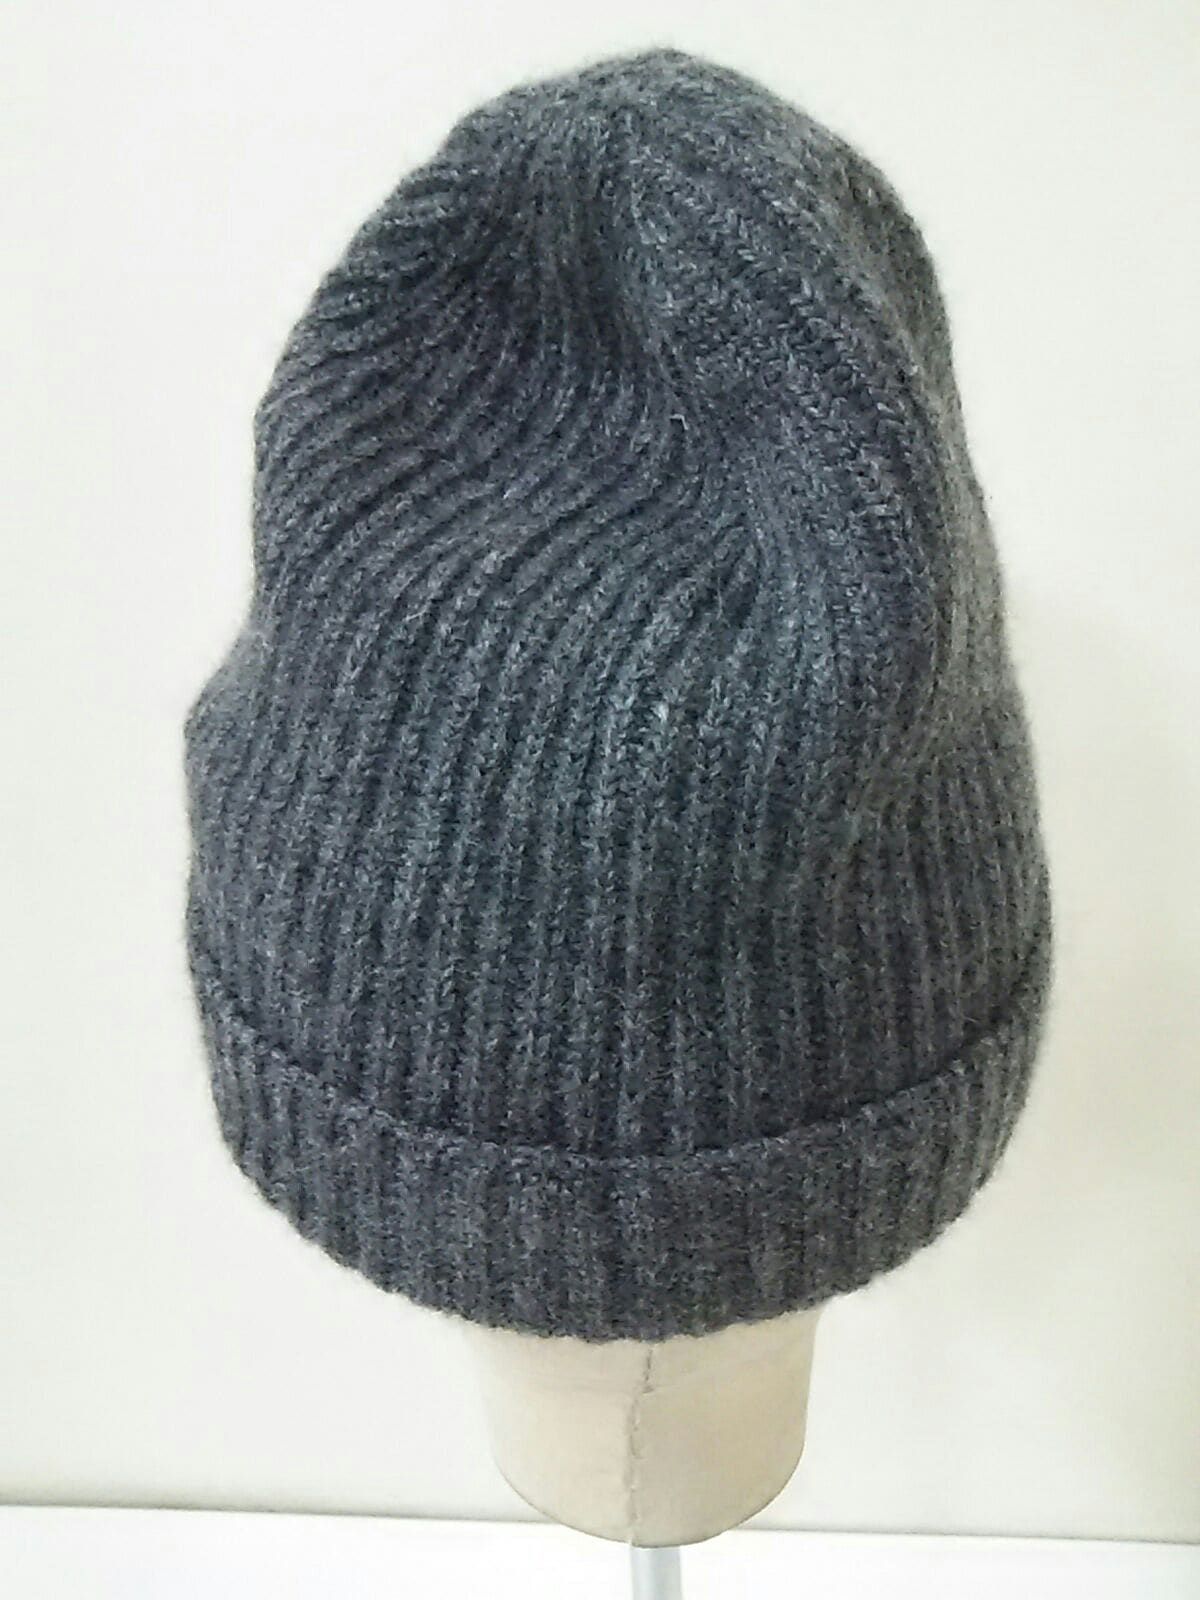 johnstonsofelgin(ジョンストンズ)の帽子